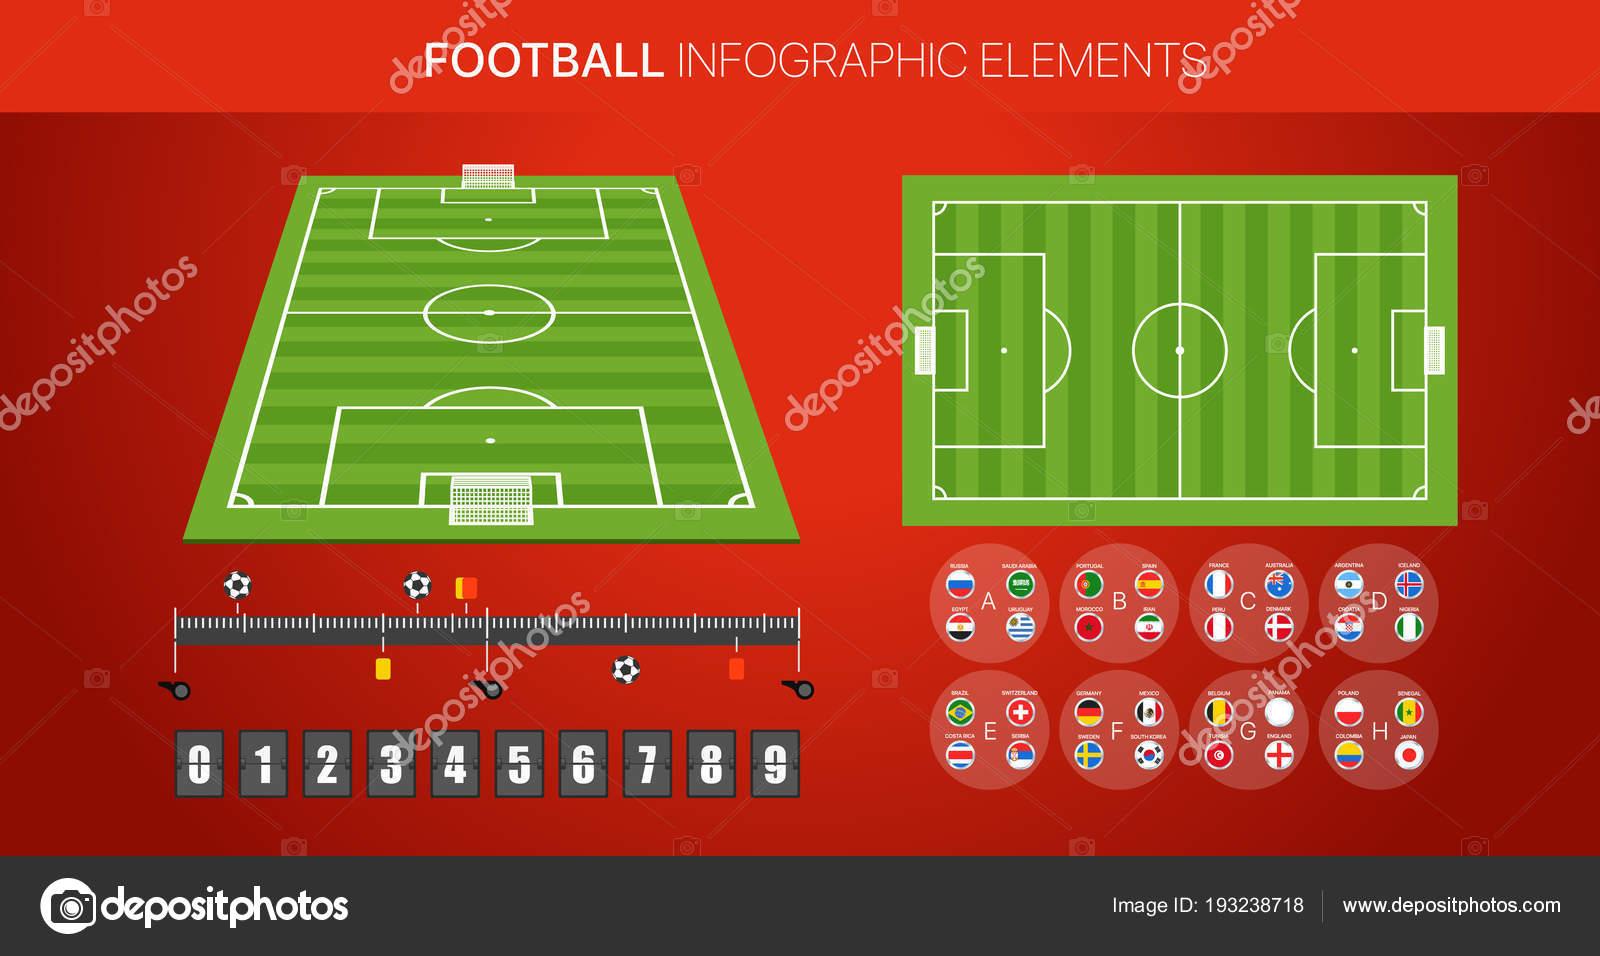 Football infographic elements  Soccer match statistics